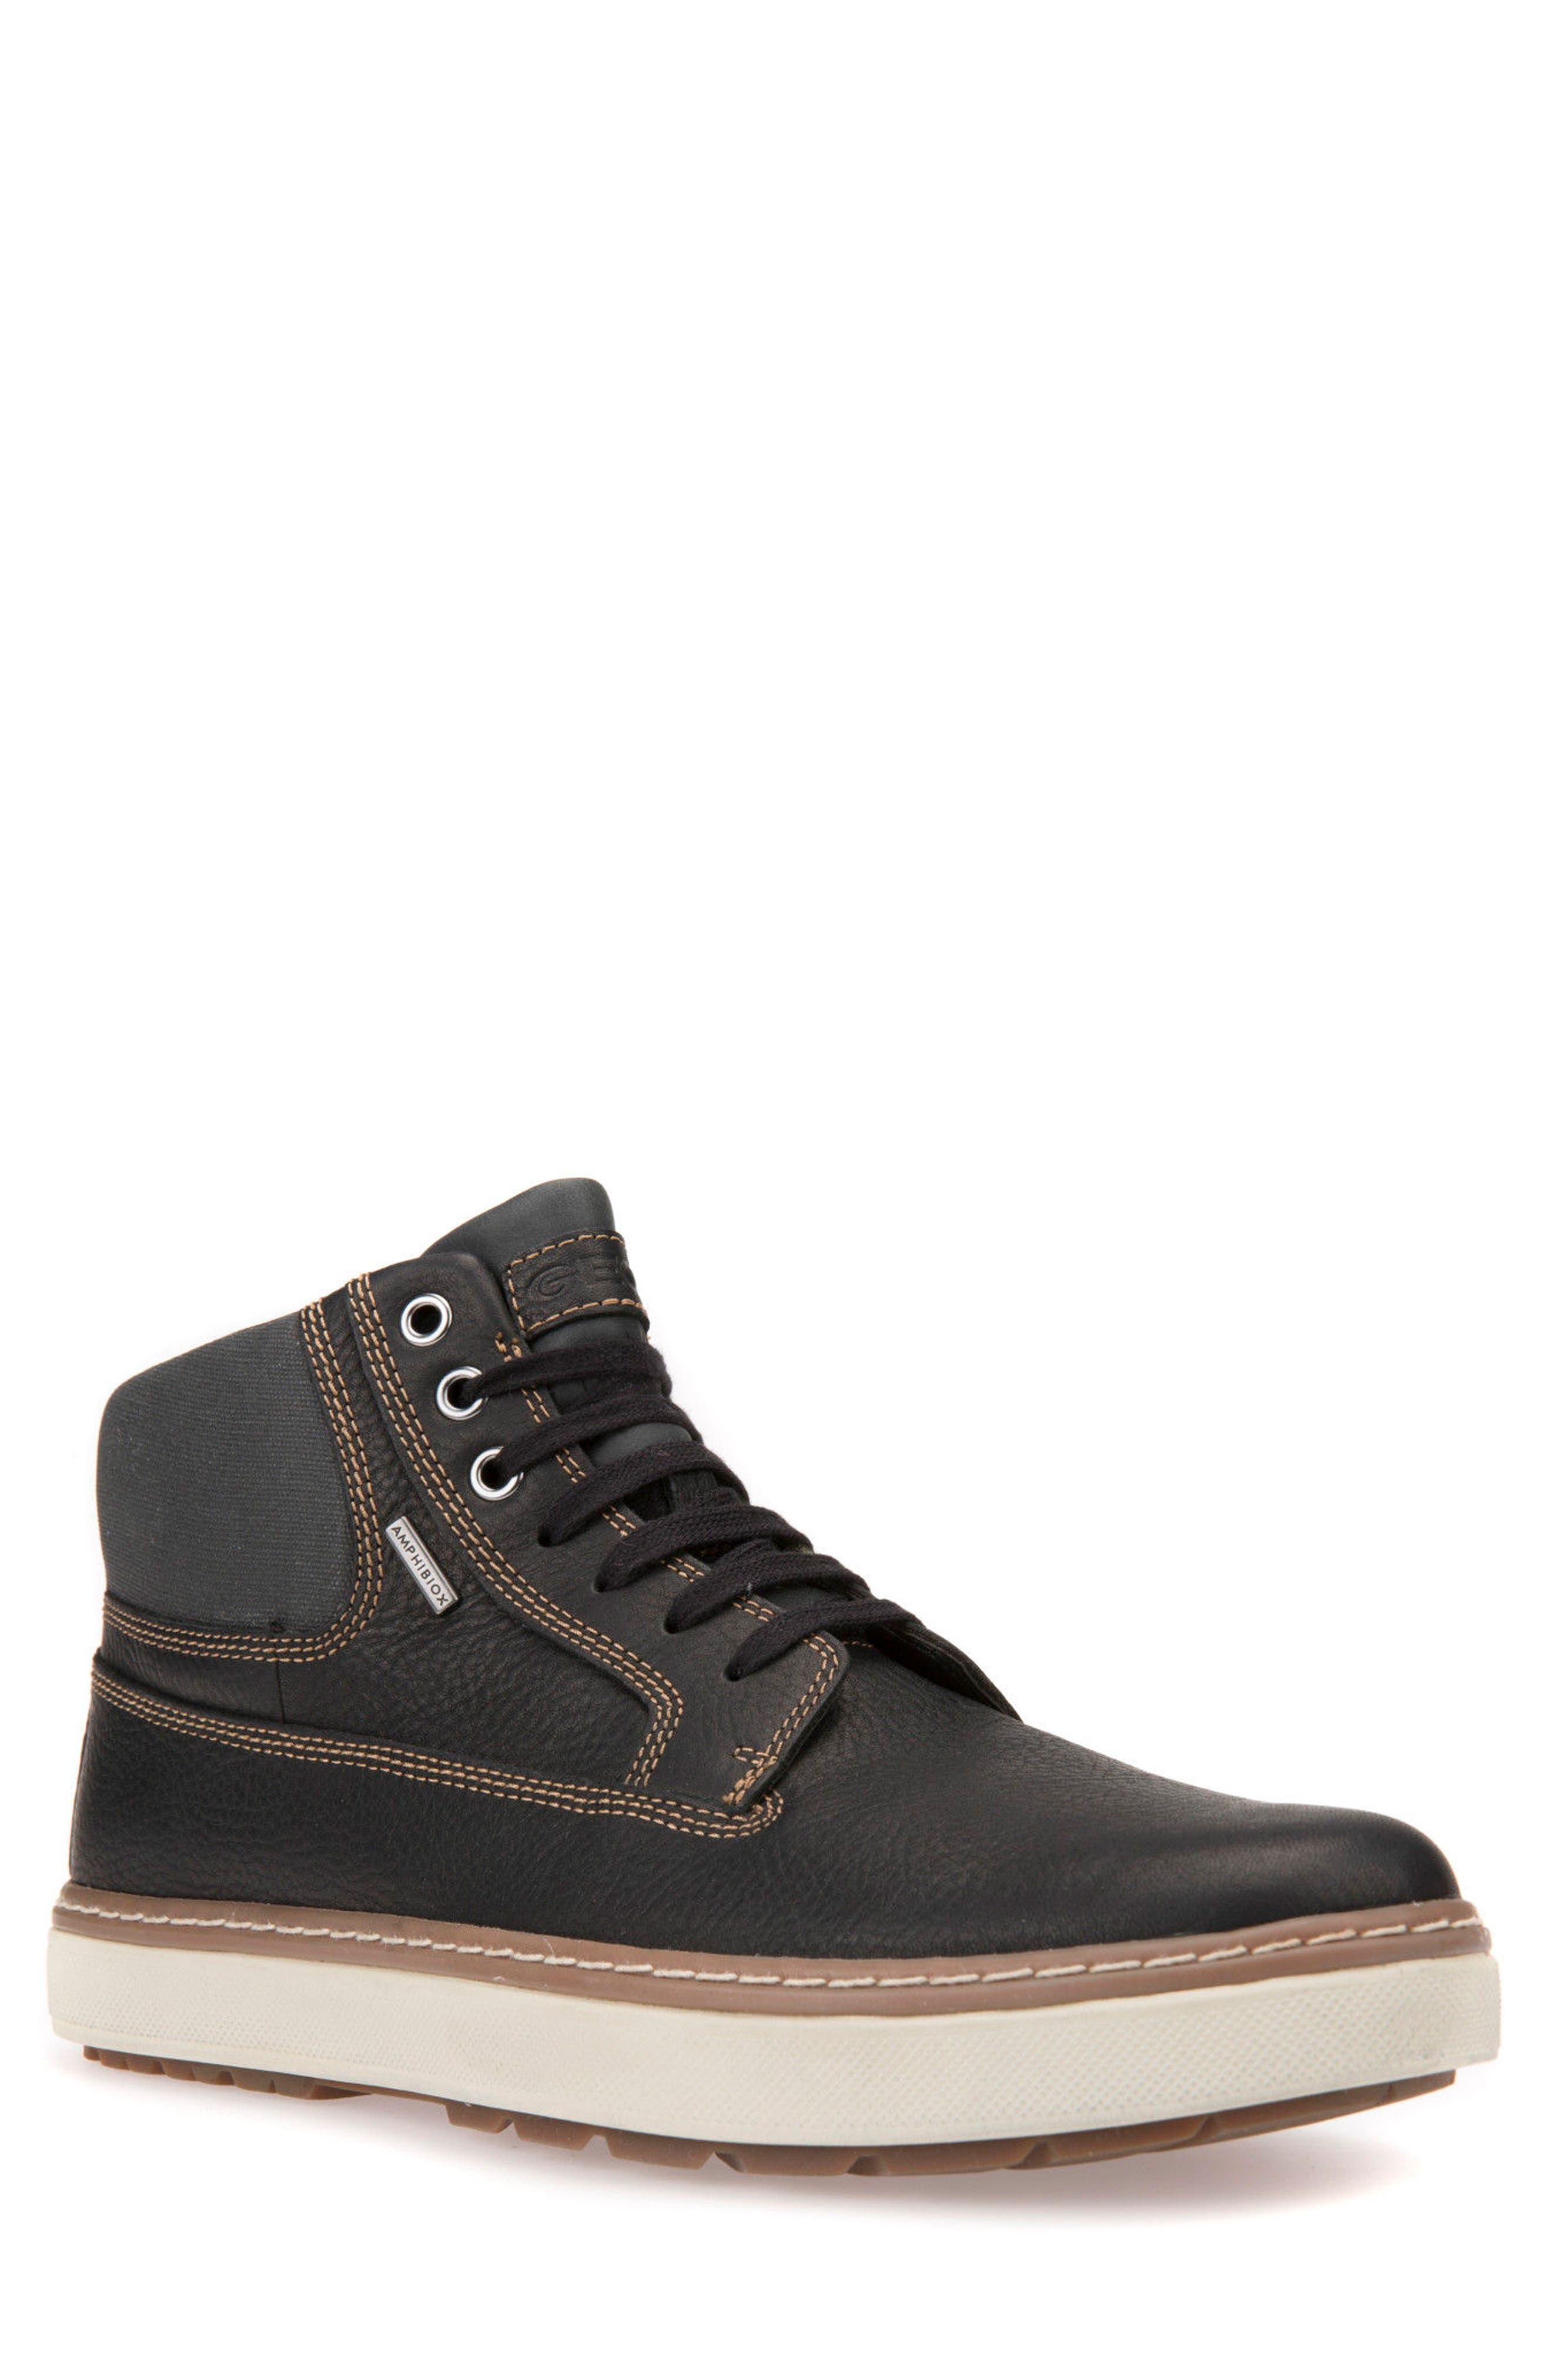 Mattias B ABX Waterproof Sneaker Boot,                             Main thumbnail 1, color,